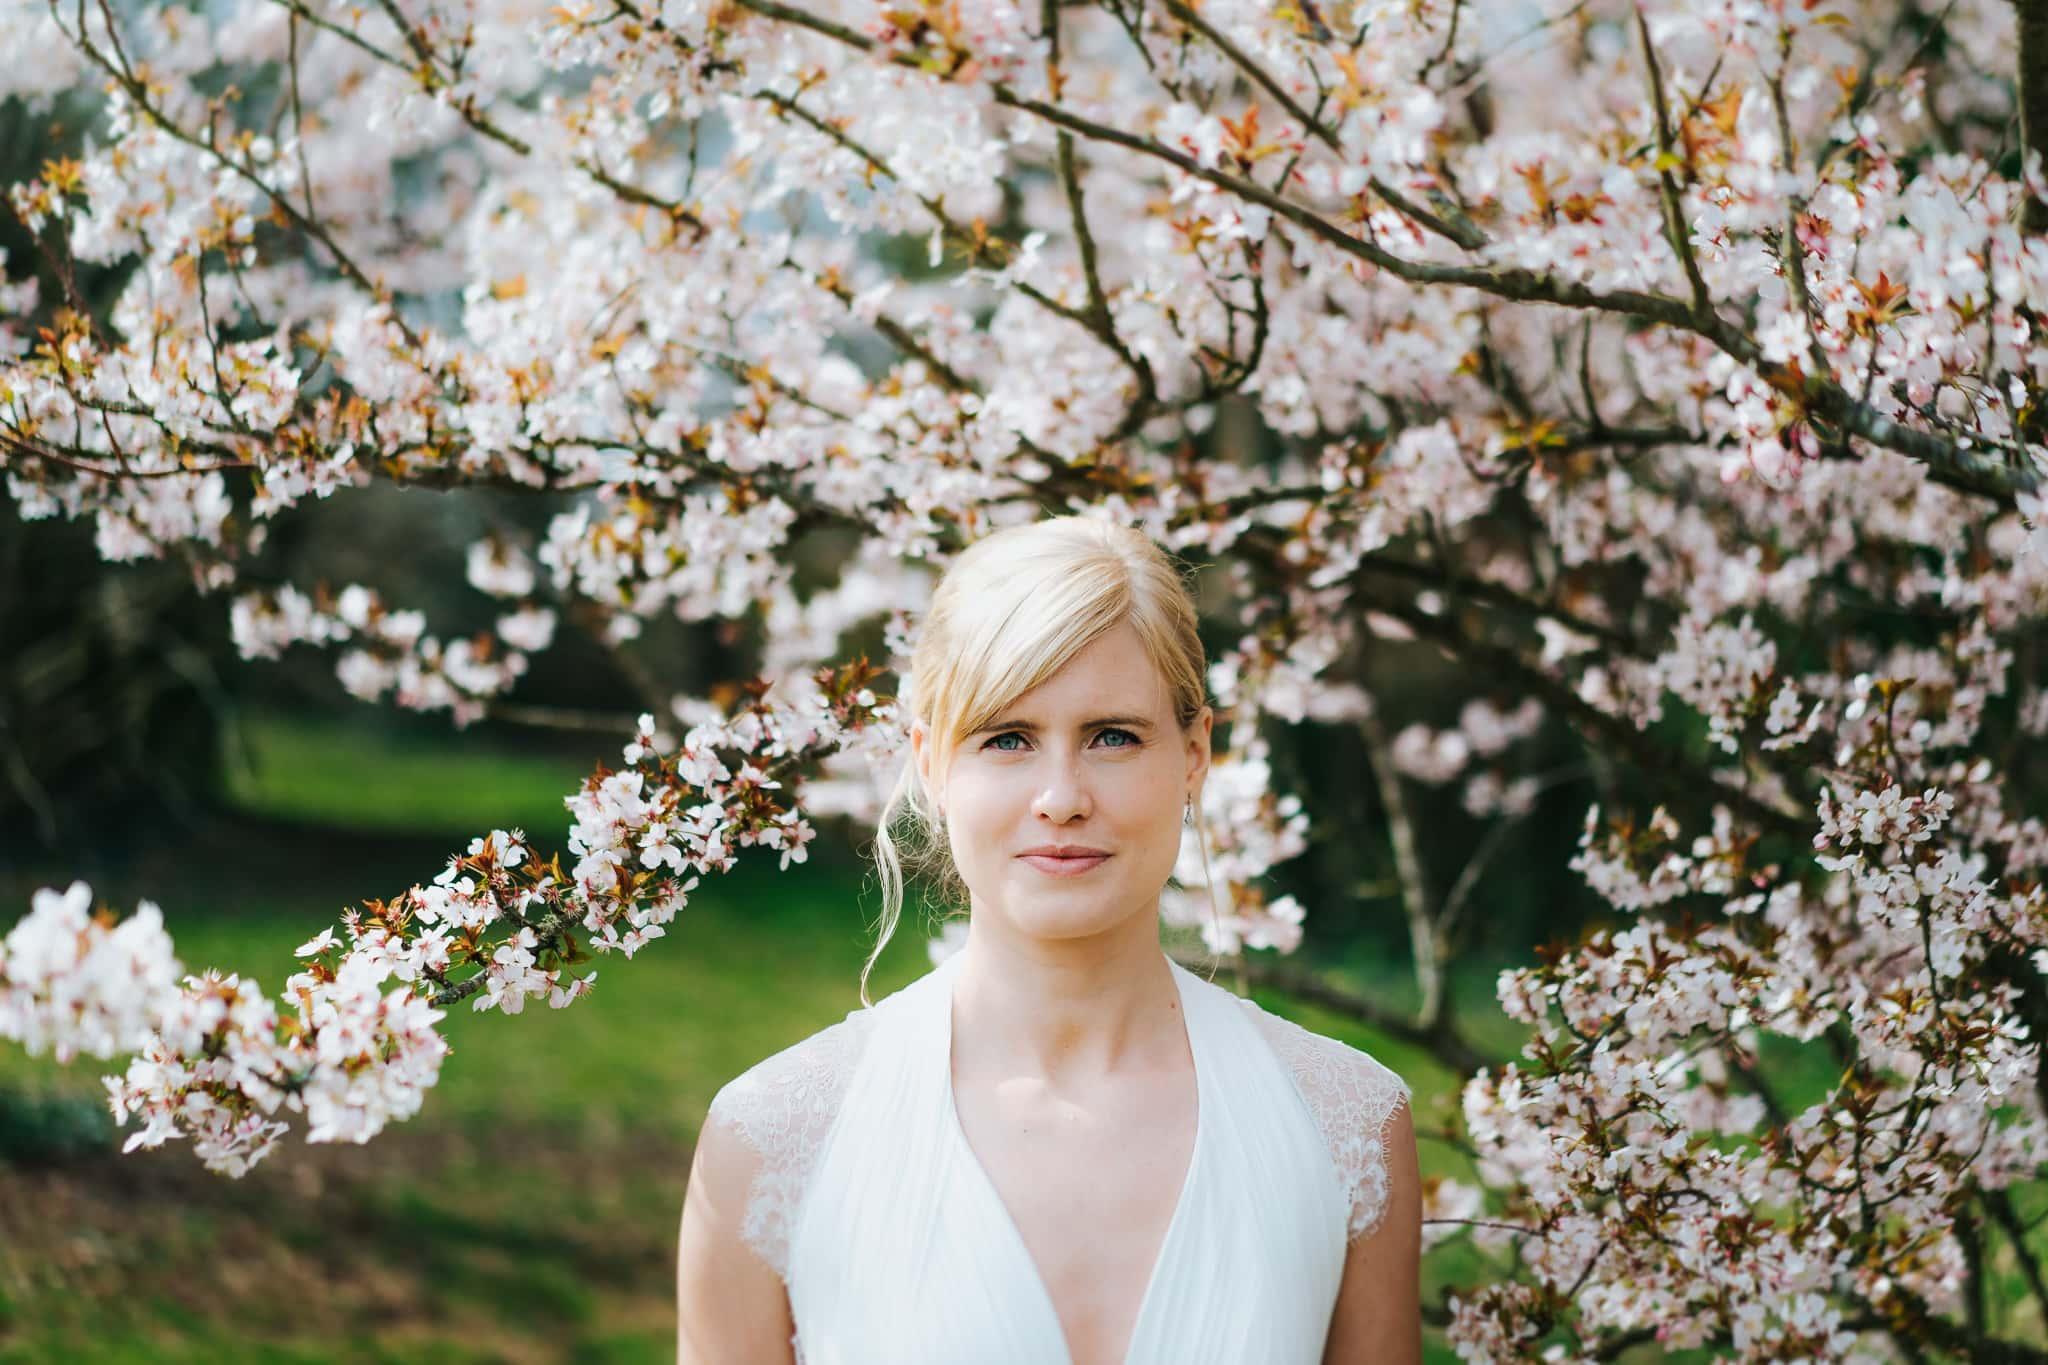 isle of wight wedding bridal portrait under cherry blossom